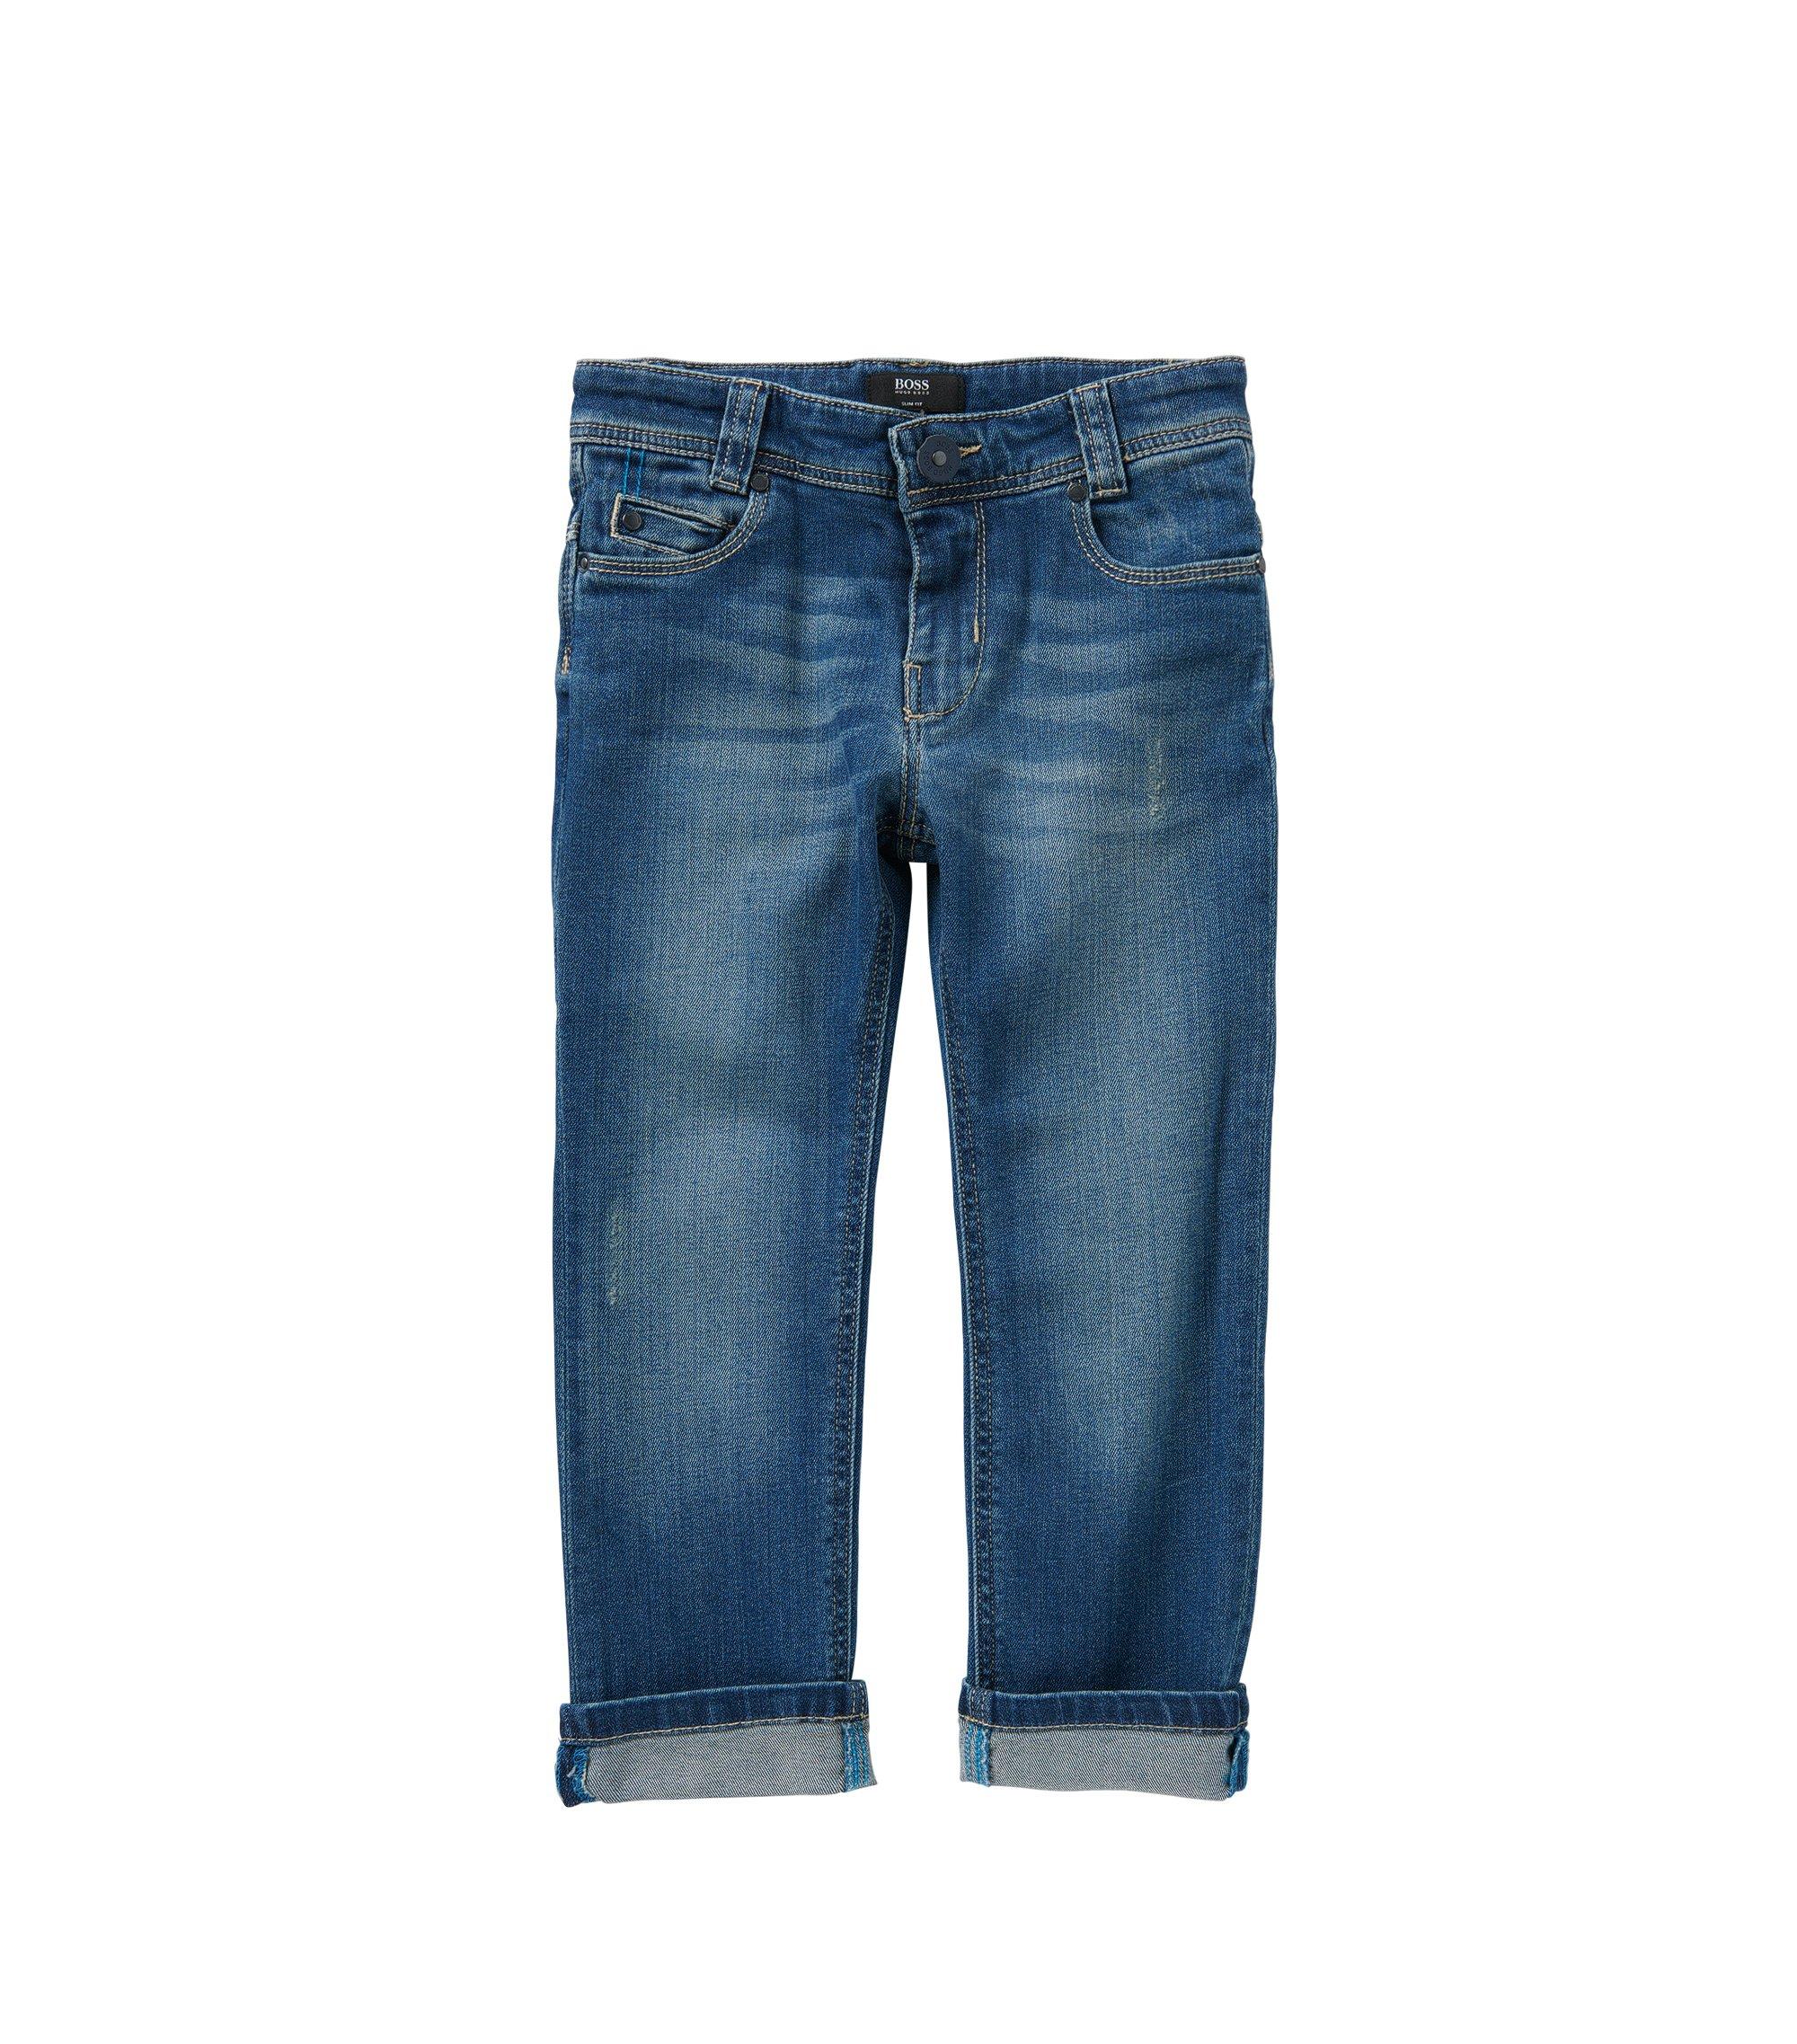 Slim-Fit Kids-Jeans aus Stretch-Baumwolle: 'Montana', Blau